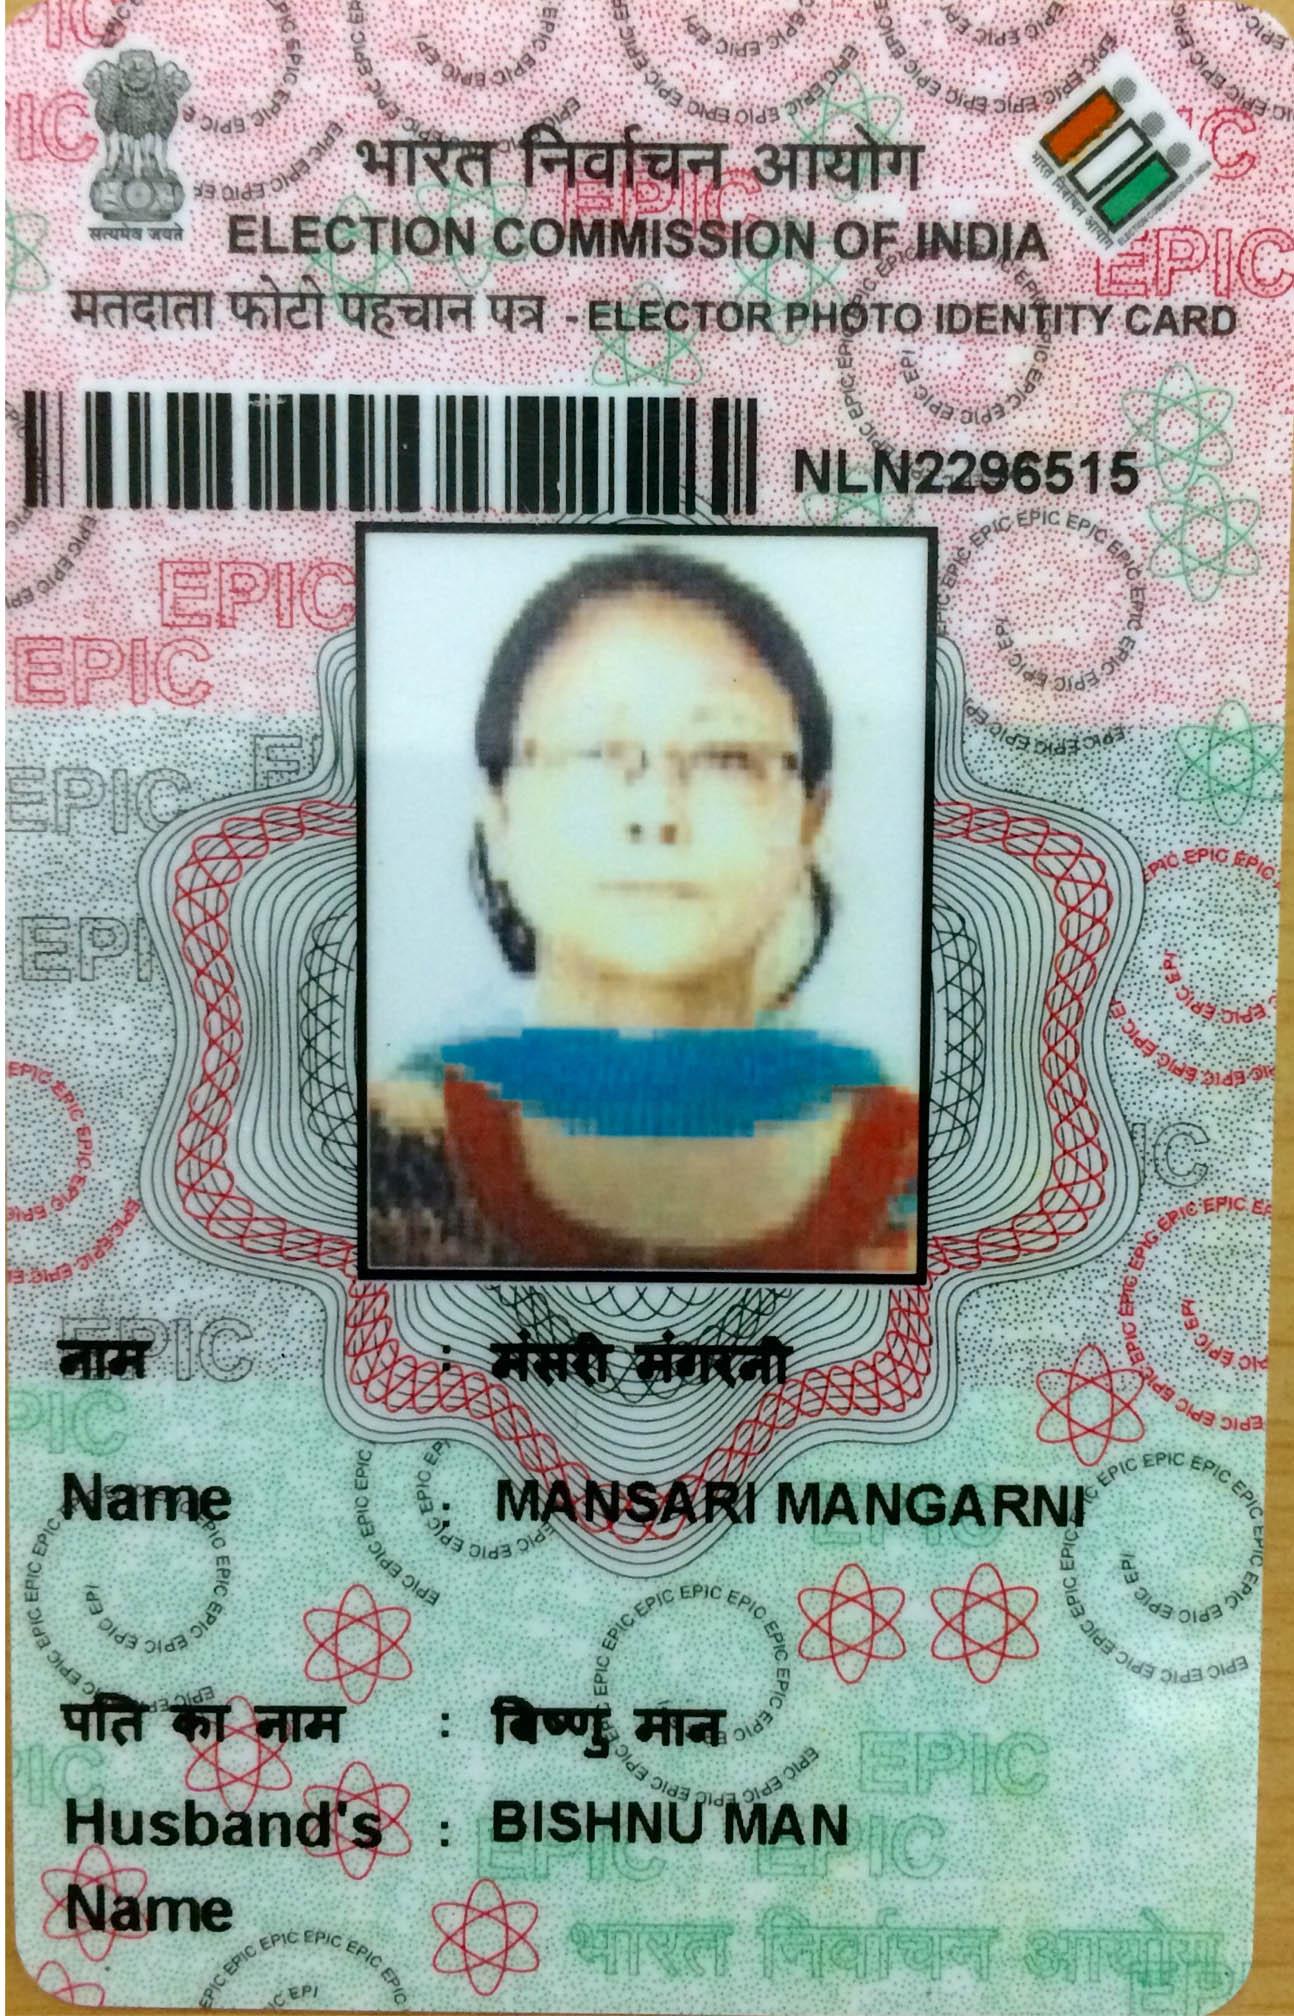 Mansari Mangarni